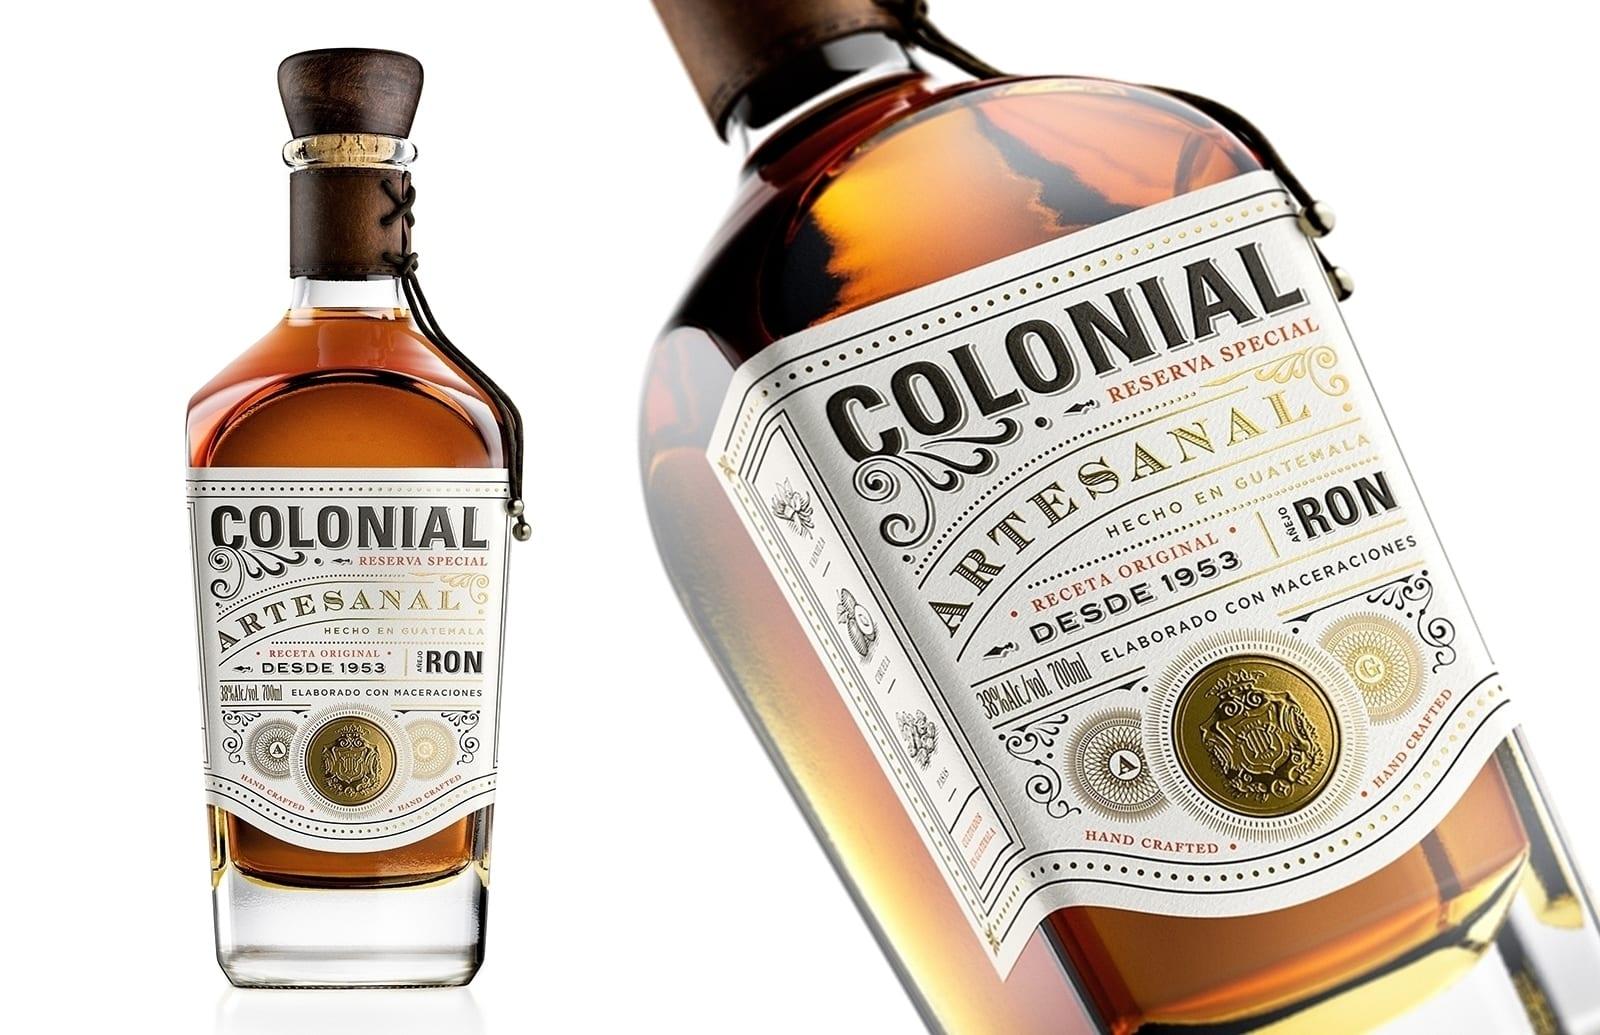 Colonial 4 - Nová vizuální identita rumu Ron Colonial